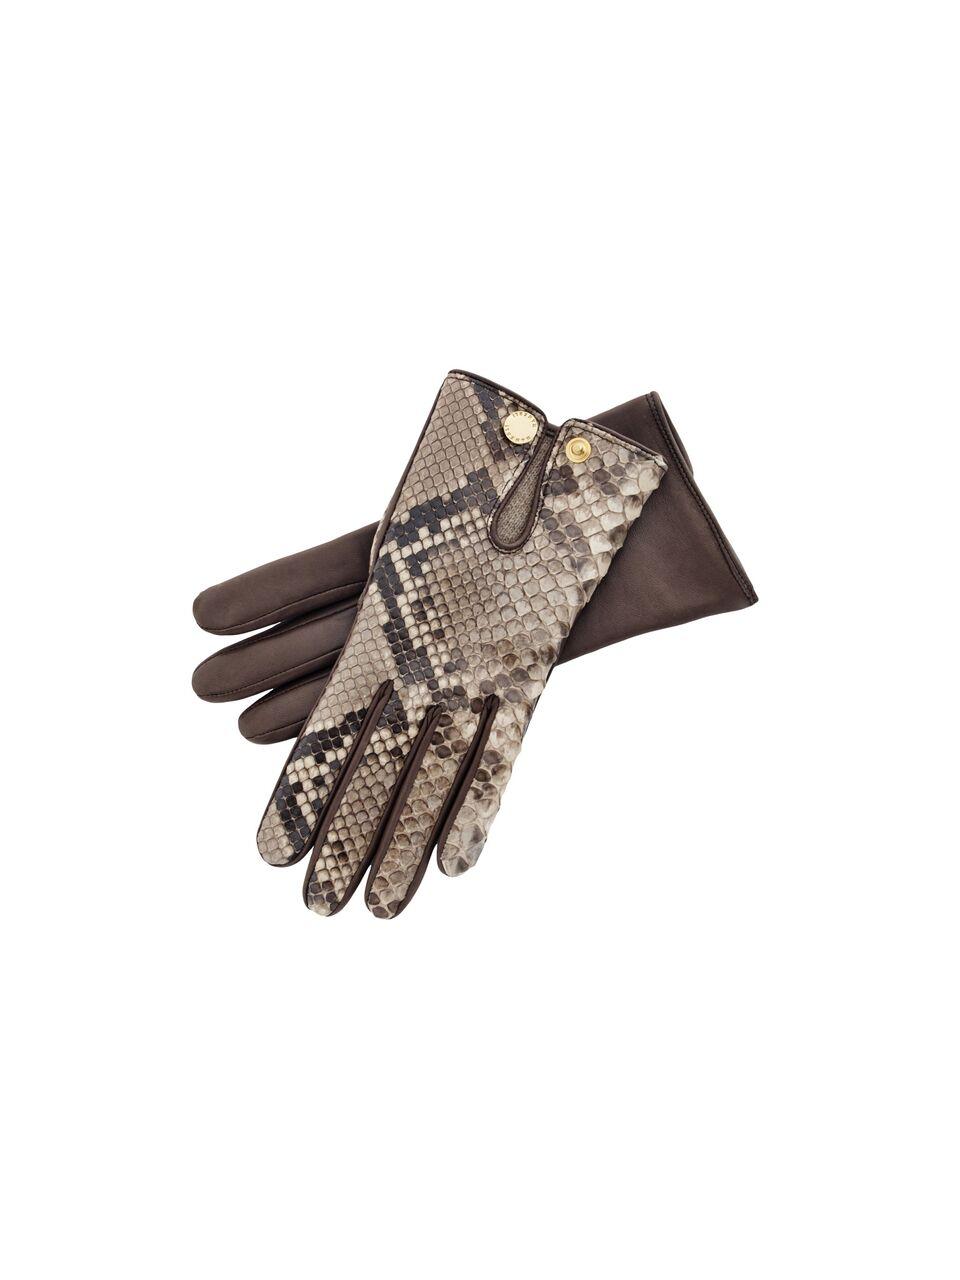 Pythone Leather Gloves Size 7.5